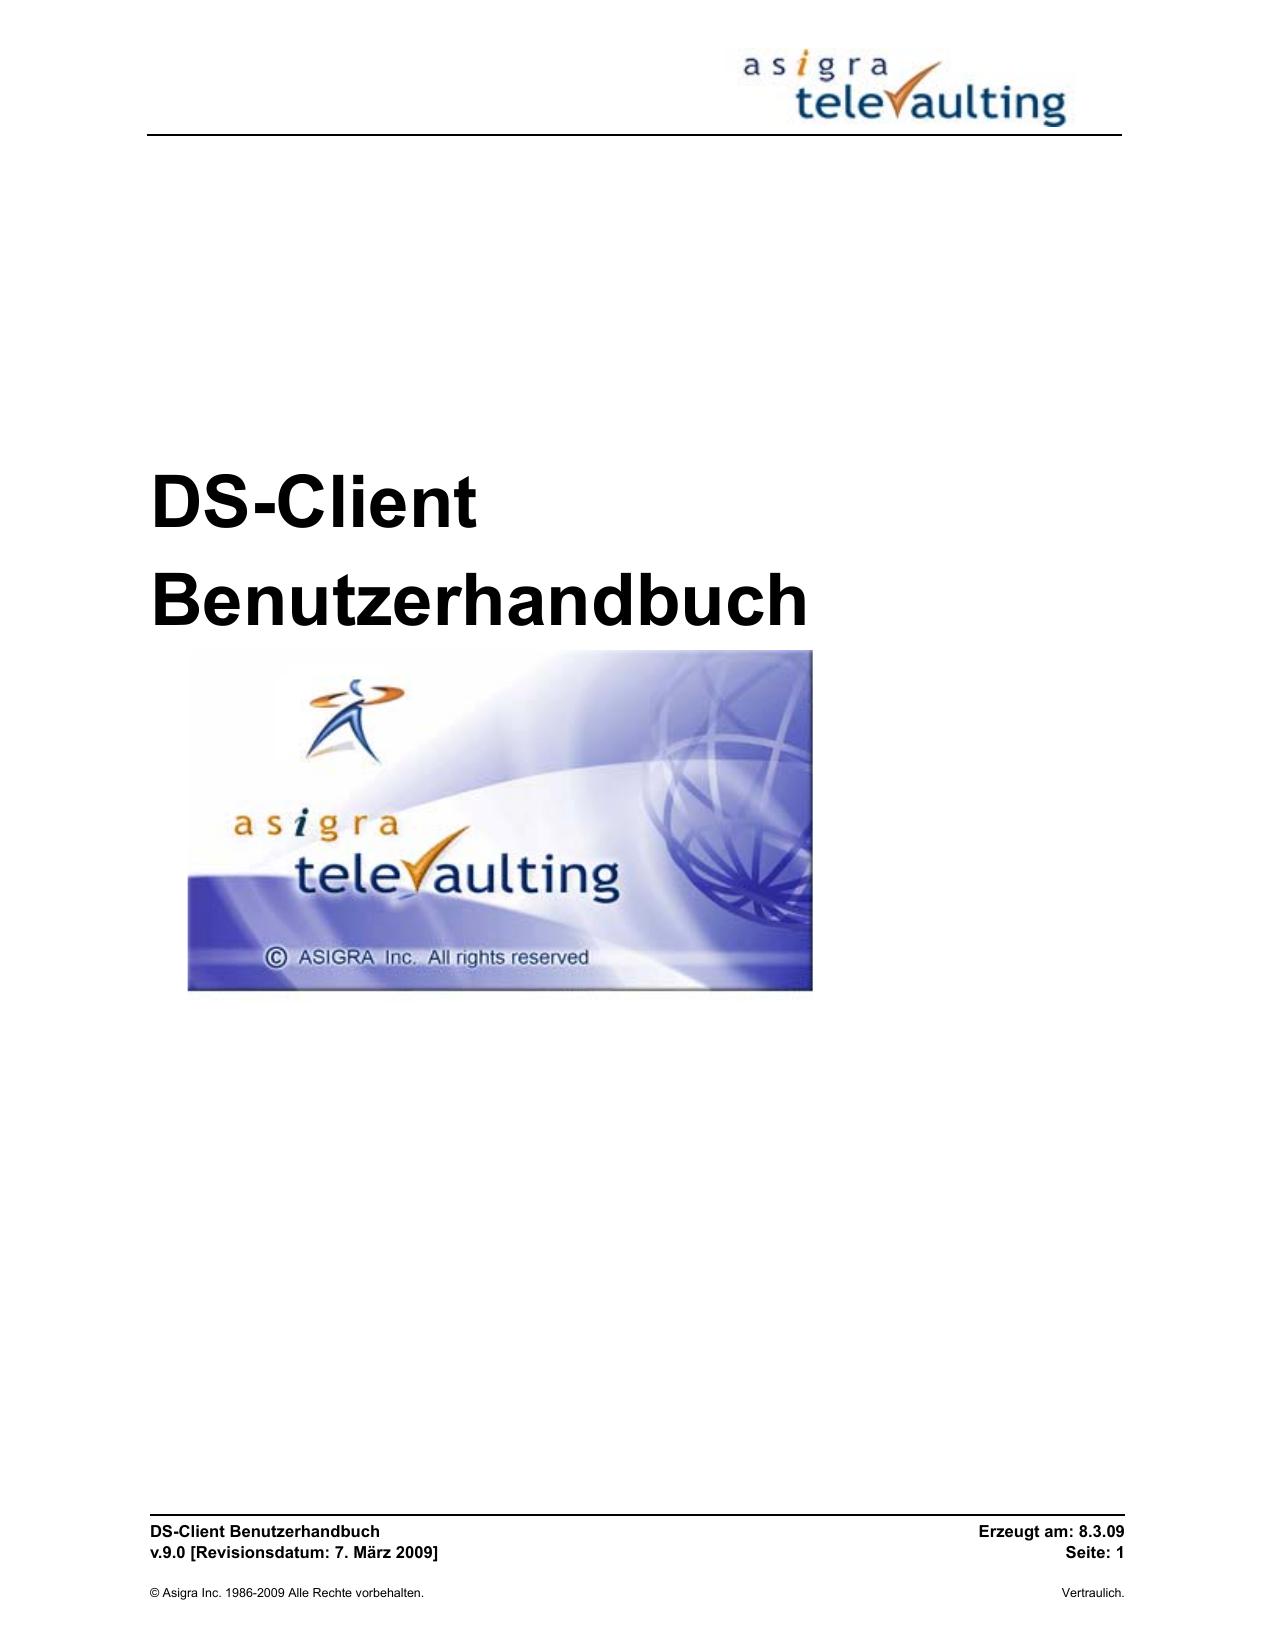 DS-Client Benutzerhandbuch | manualzz.com